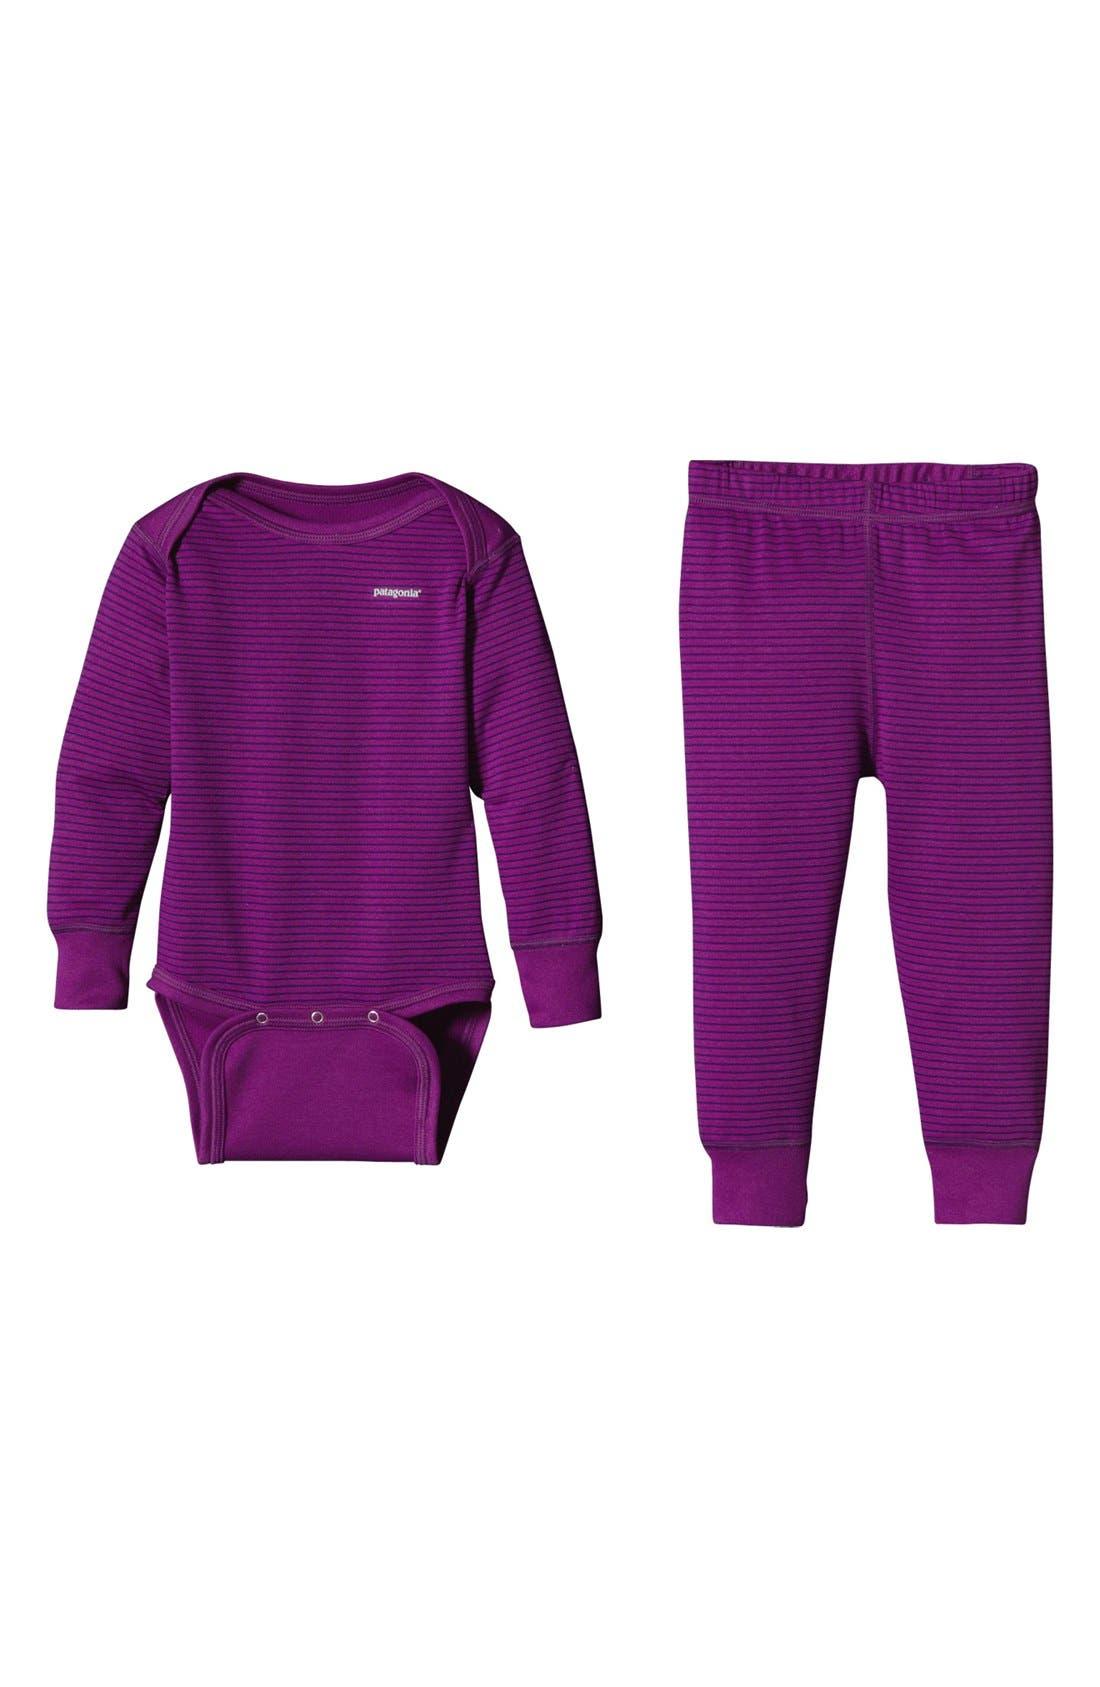 Alternate Image 1 Selected - Patagonia Bodysuit & Pants (Infant)